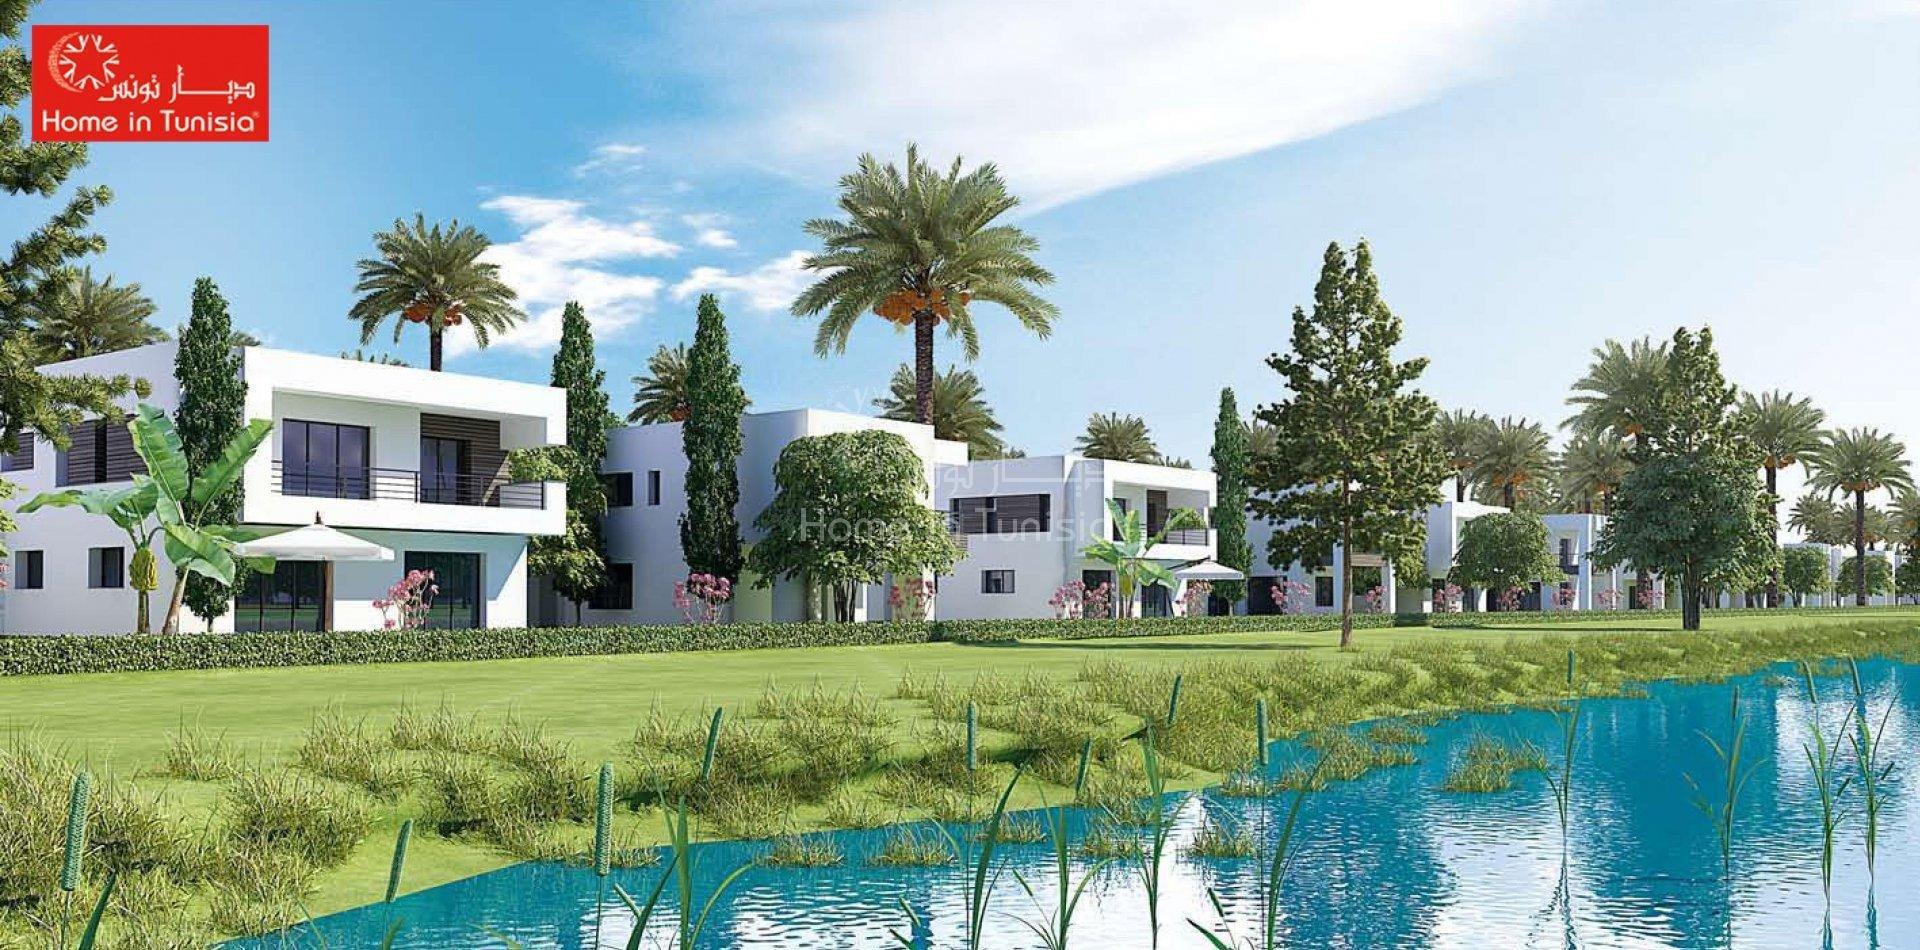 Tunis Bay résidentiel golf villa Oceanos 18 jumelée 4 chambres terrasse jardin piscine privee